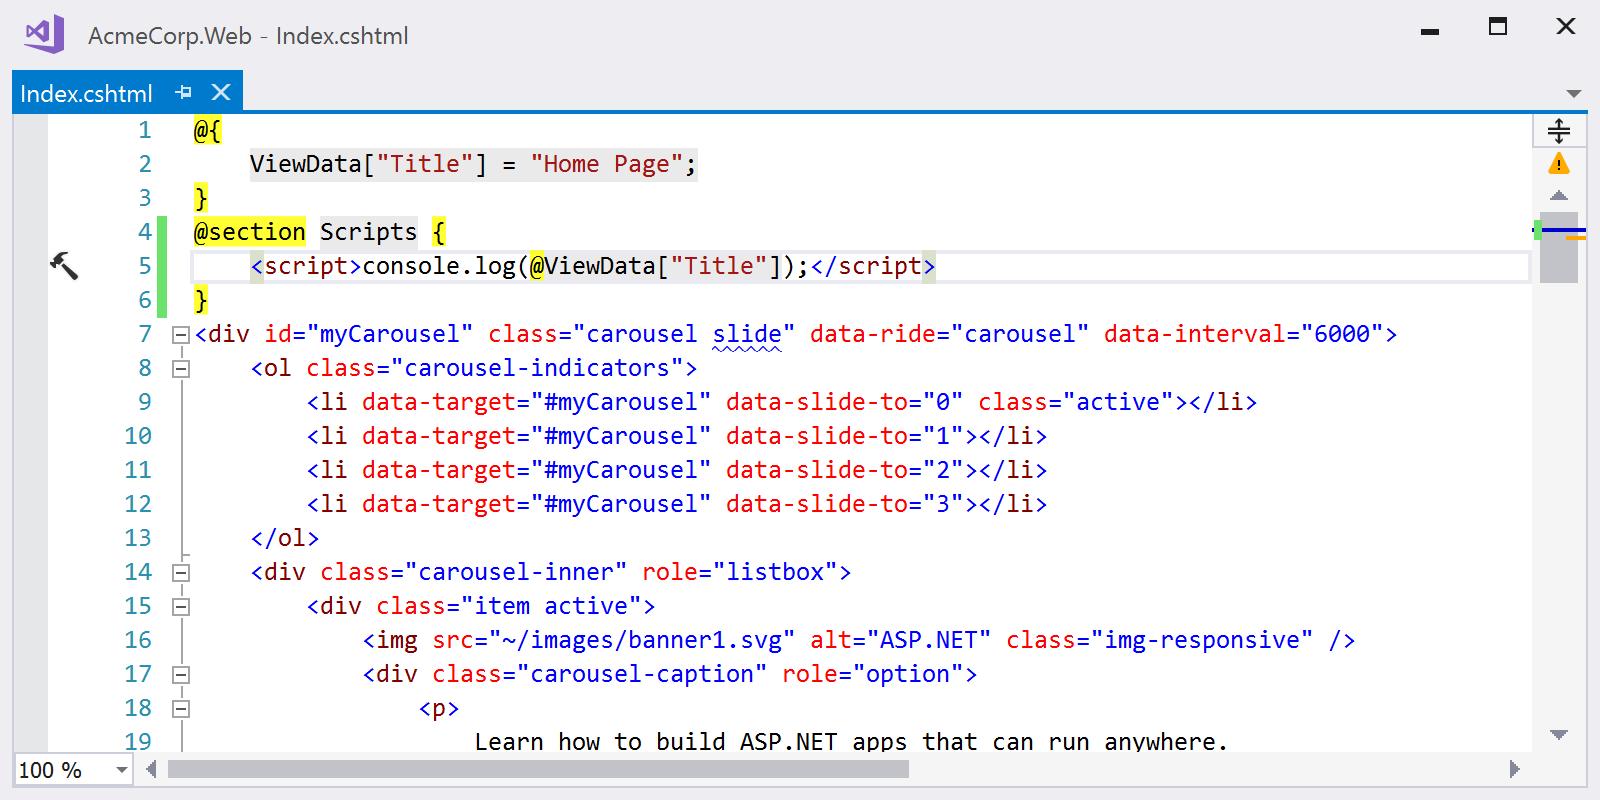 Using Reformat Code to apply Razor code style